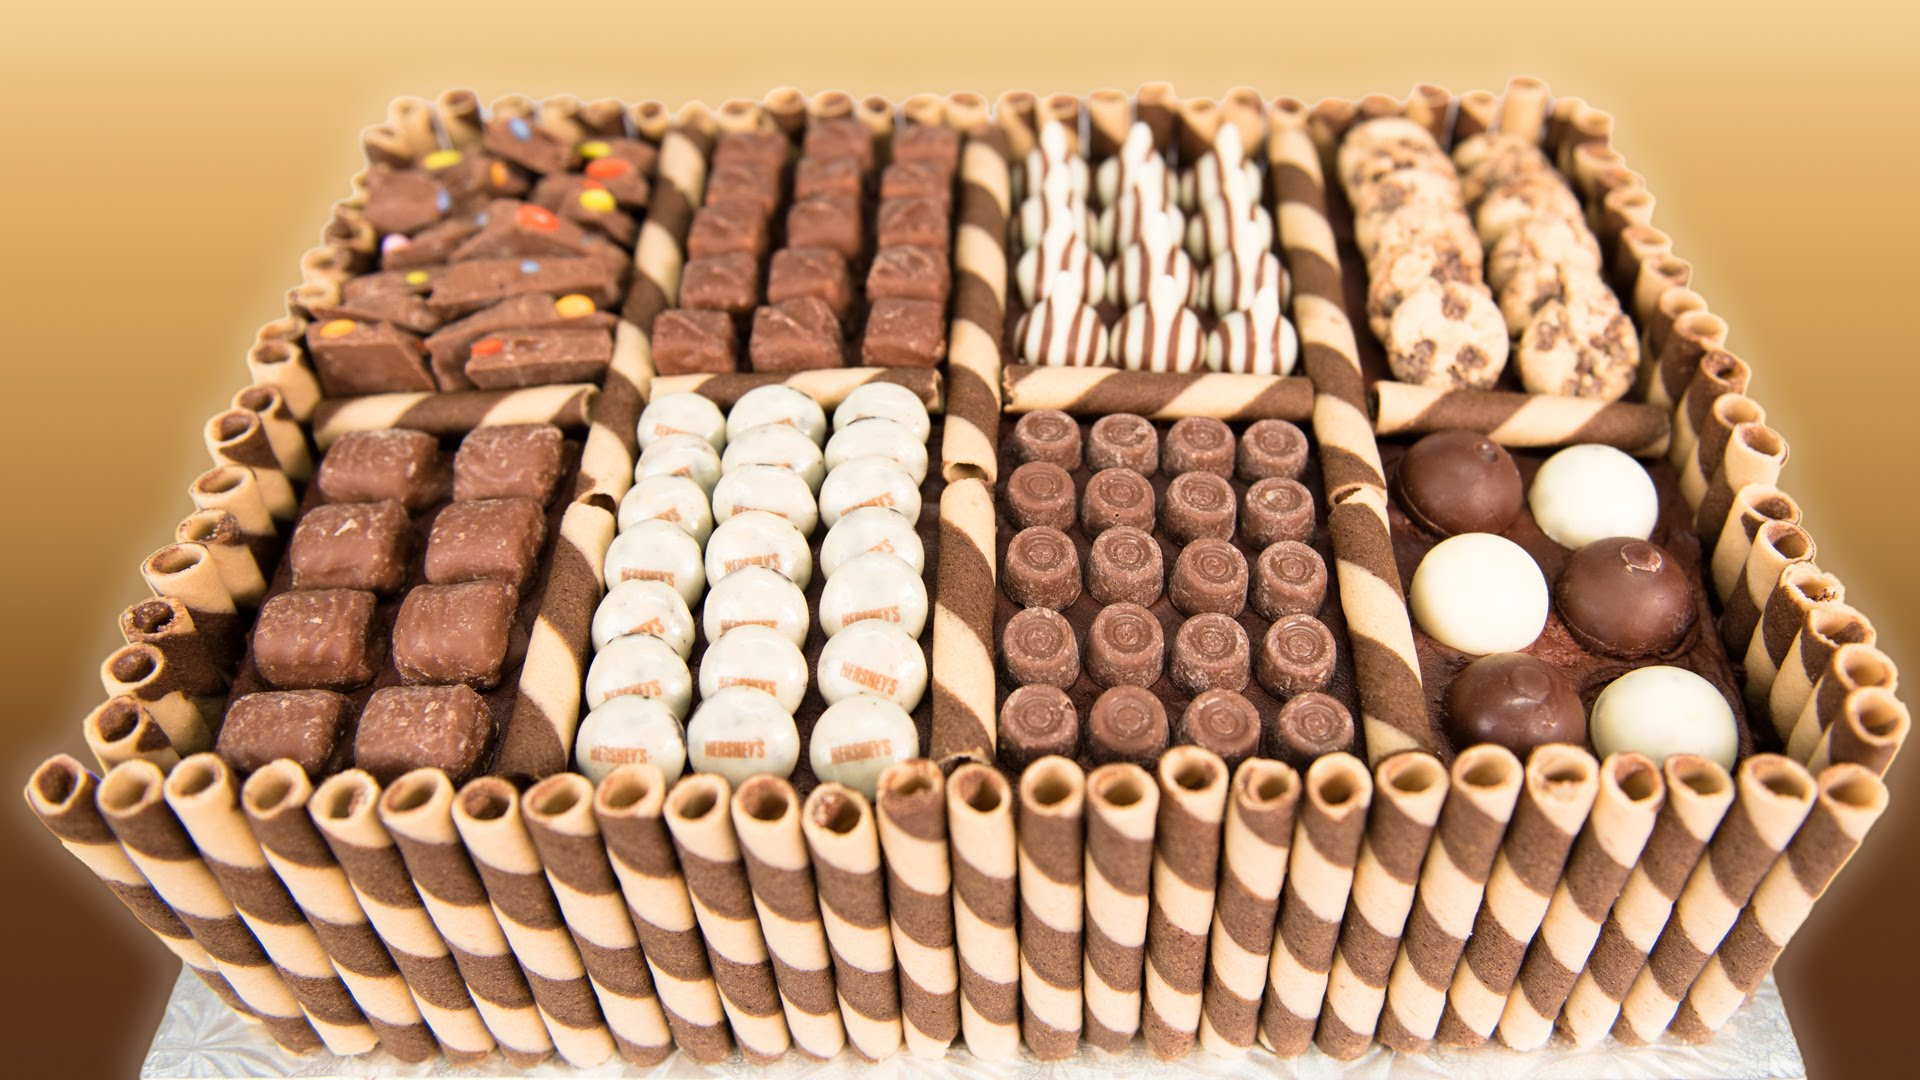 Beautifully made chocolate stick cookies